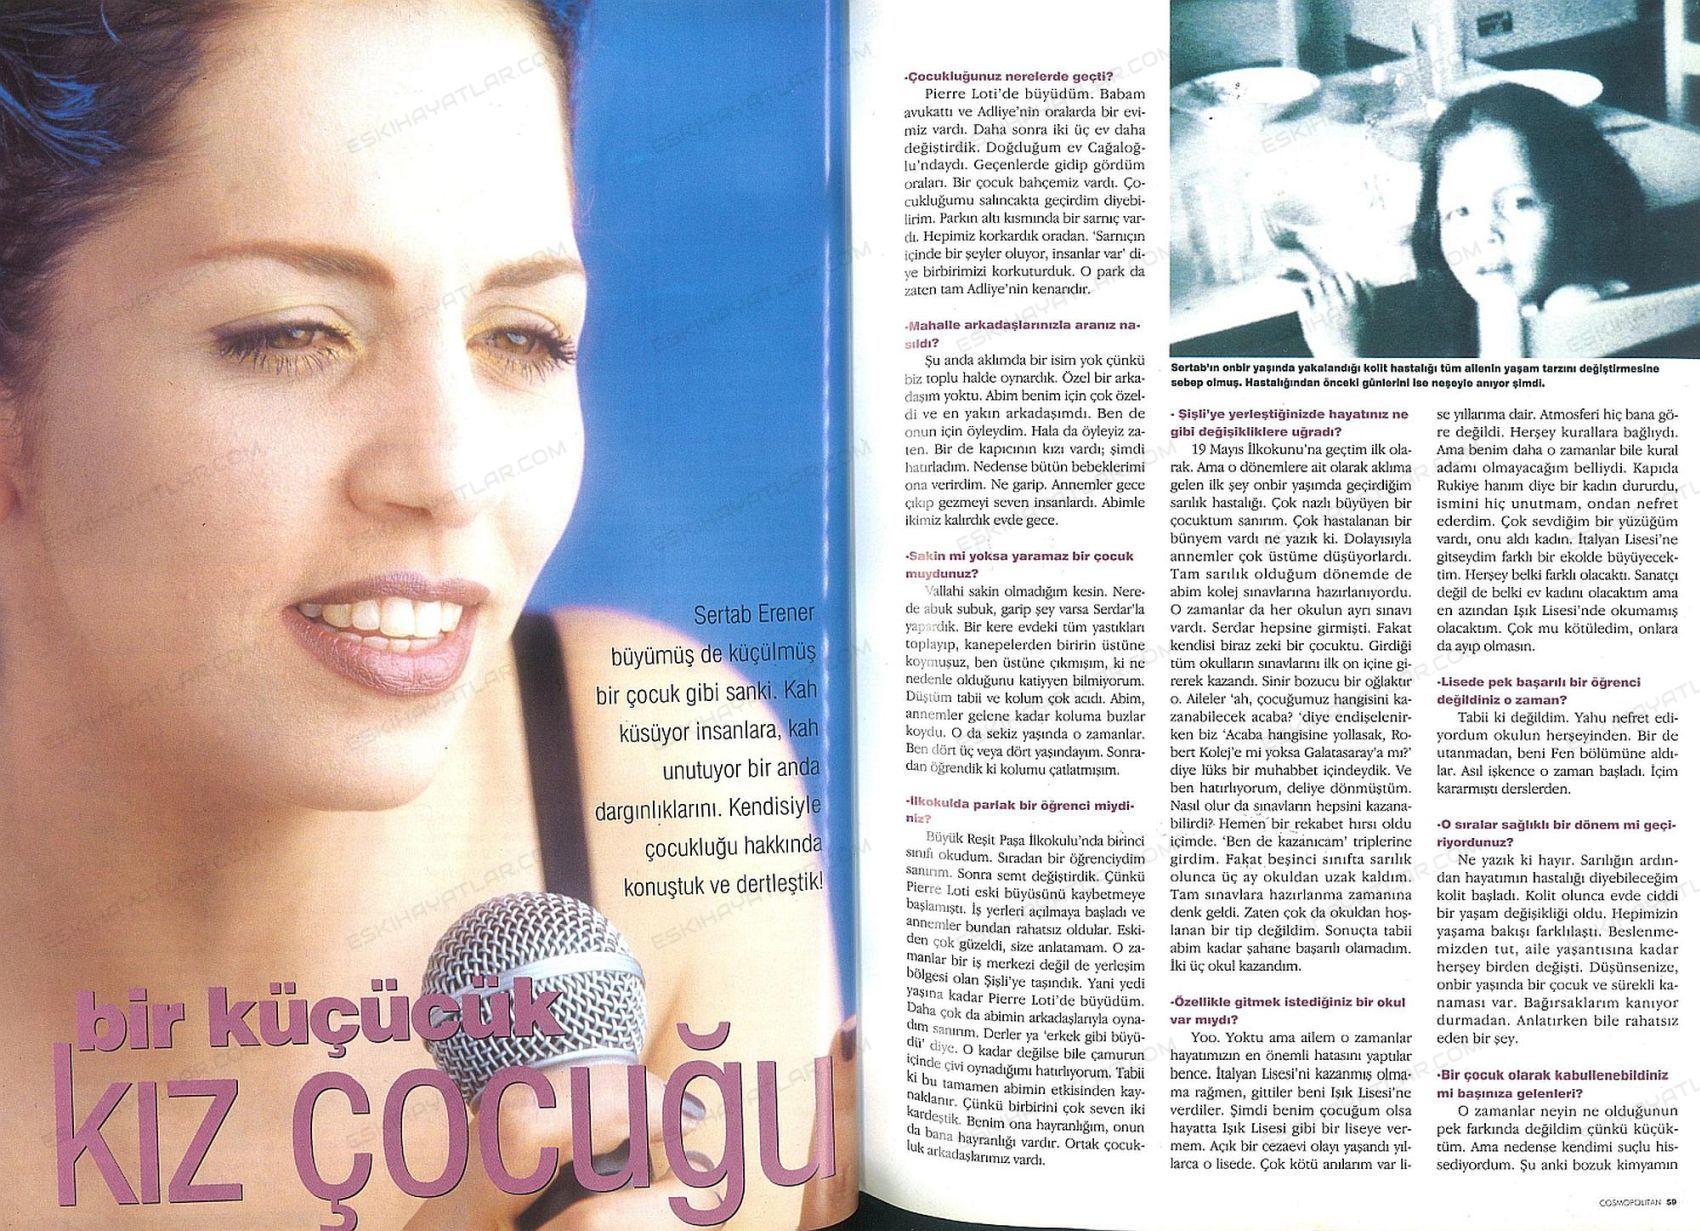 0284-bir-kucucuk-kiz-cocugu-1997-sertab-erener-roportaji (2)